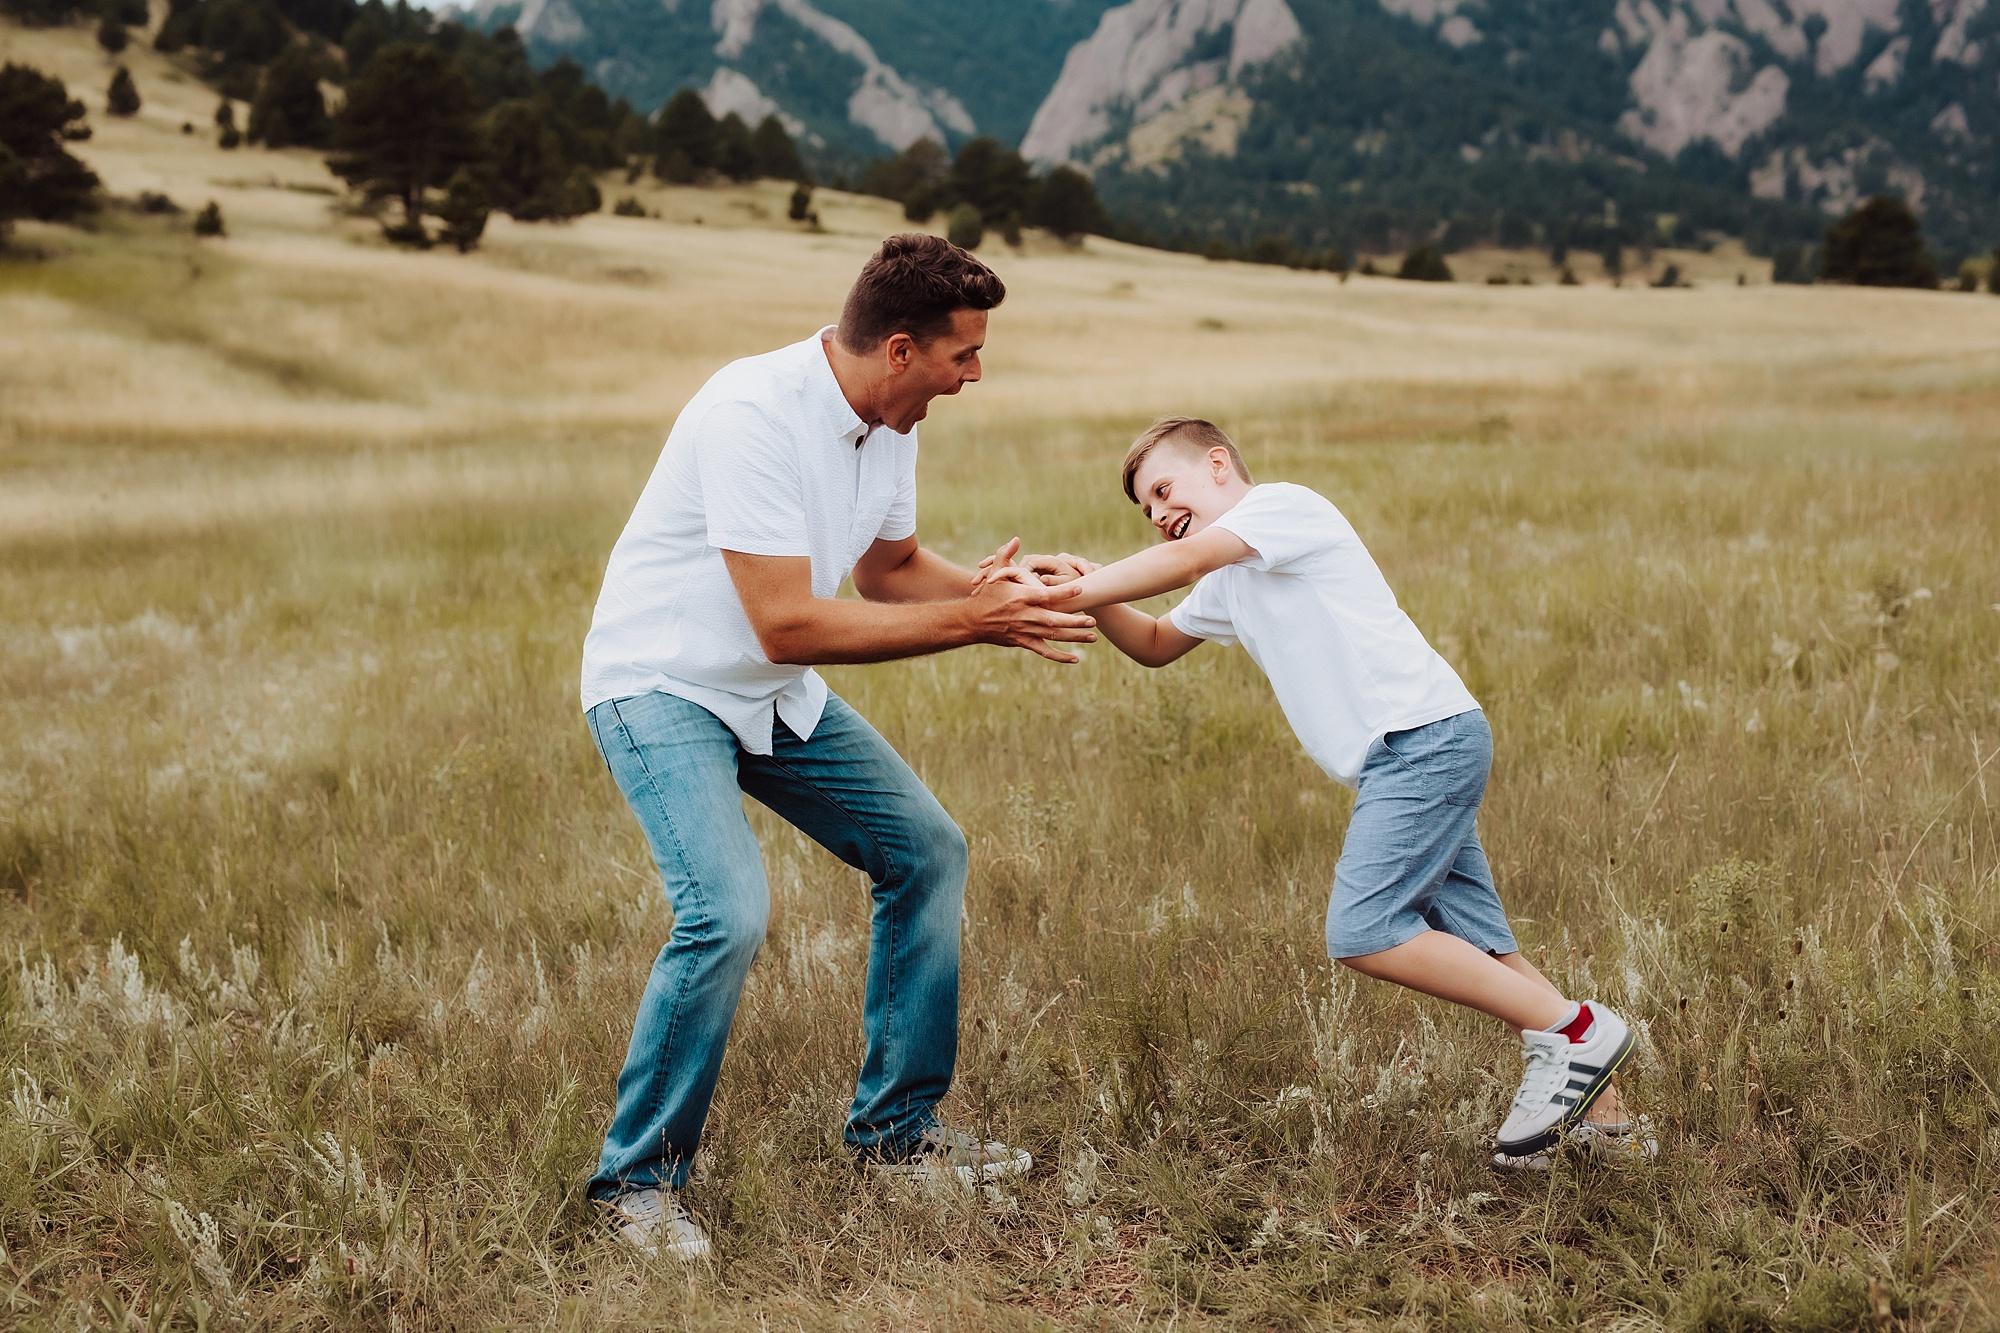 Boulder Photographer   www.julielivermorephotography.com